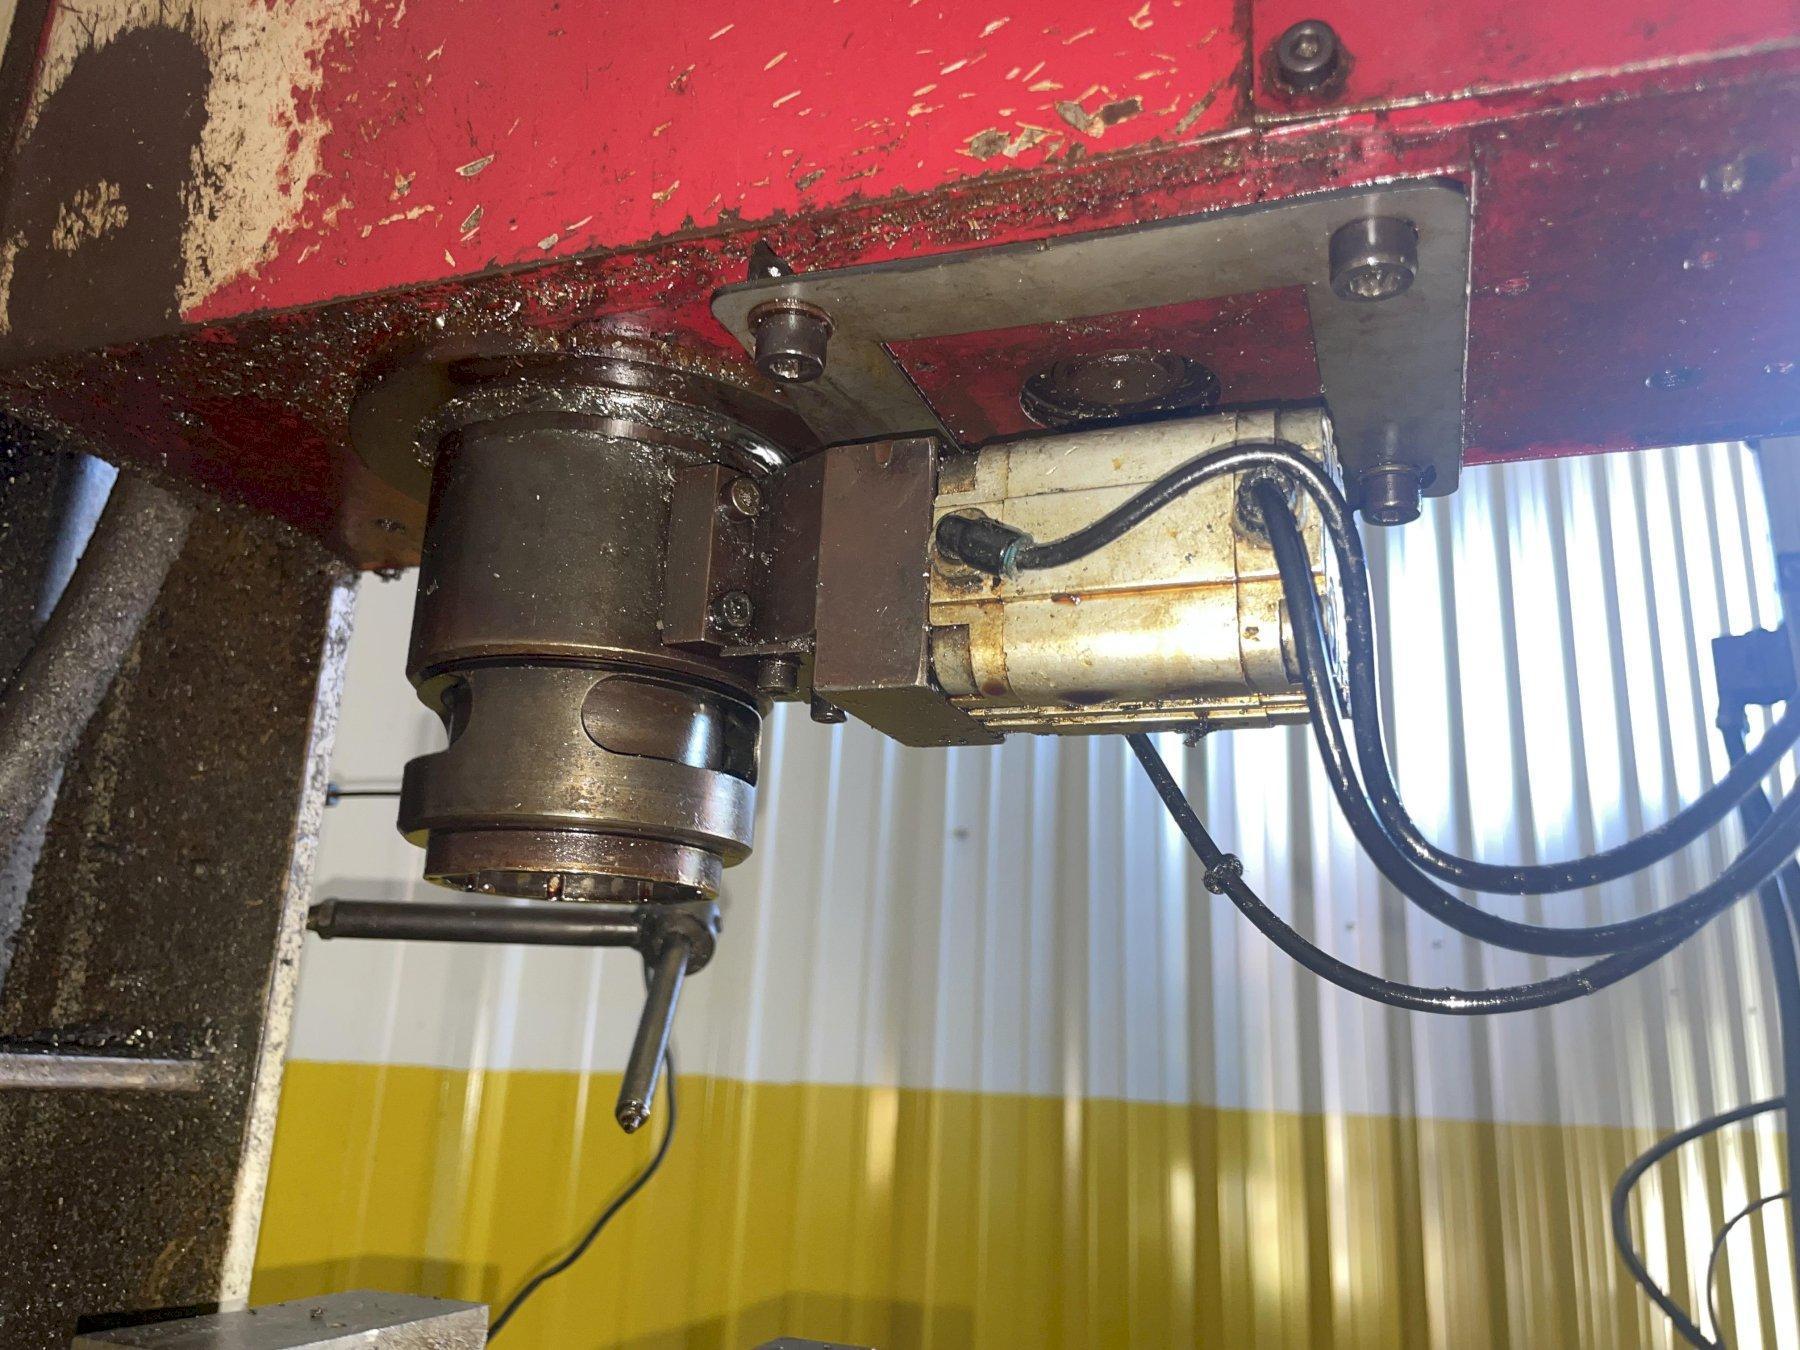 "2"" T-DRILL MODEL #S-54 AUTOMATIC TUBE COLLARING MACHINE: STOCK #15430"